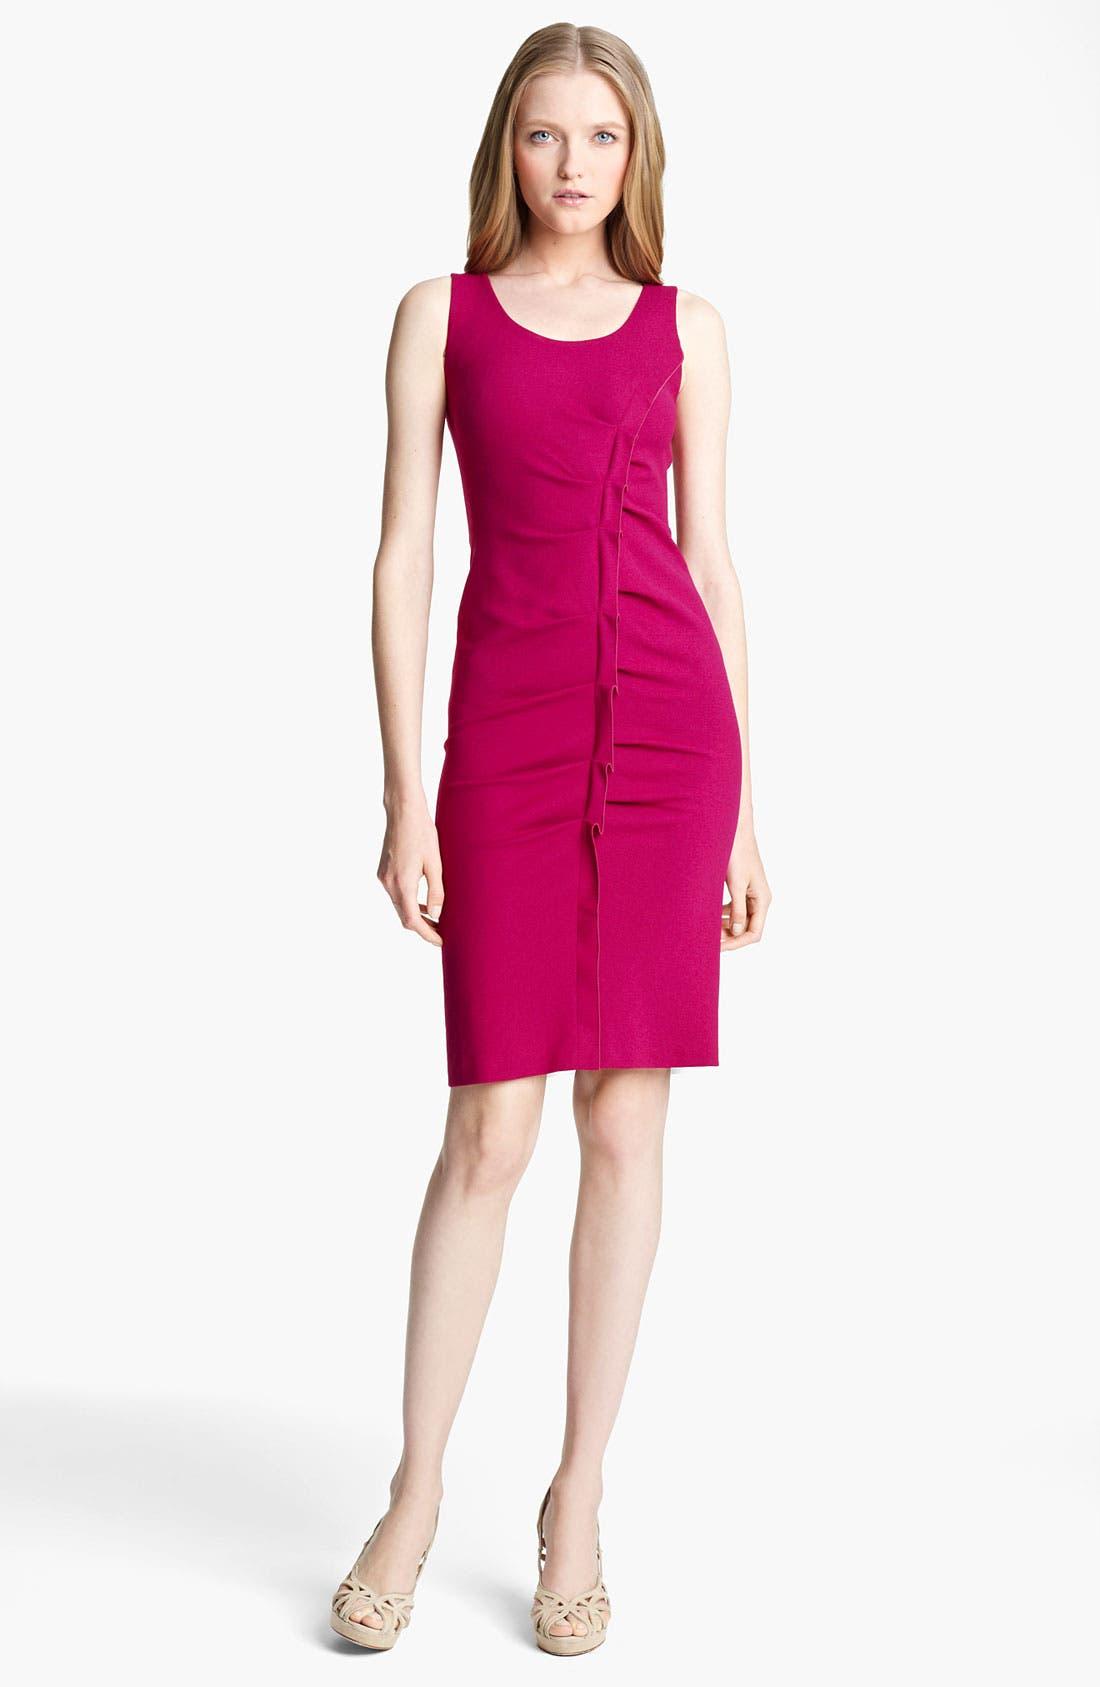 Main Image - Armani Collezioni Tuck Detail Jersey Dress